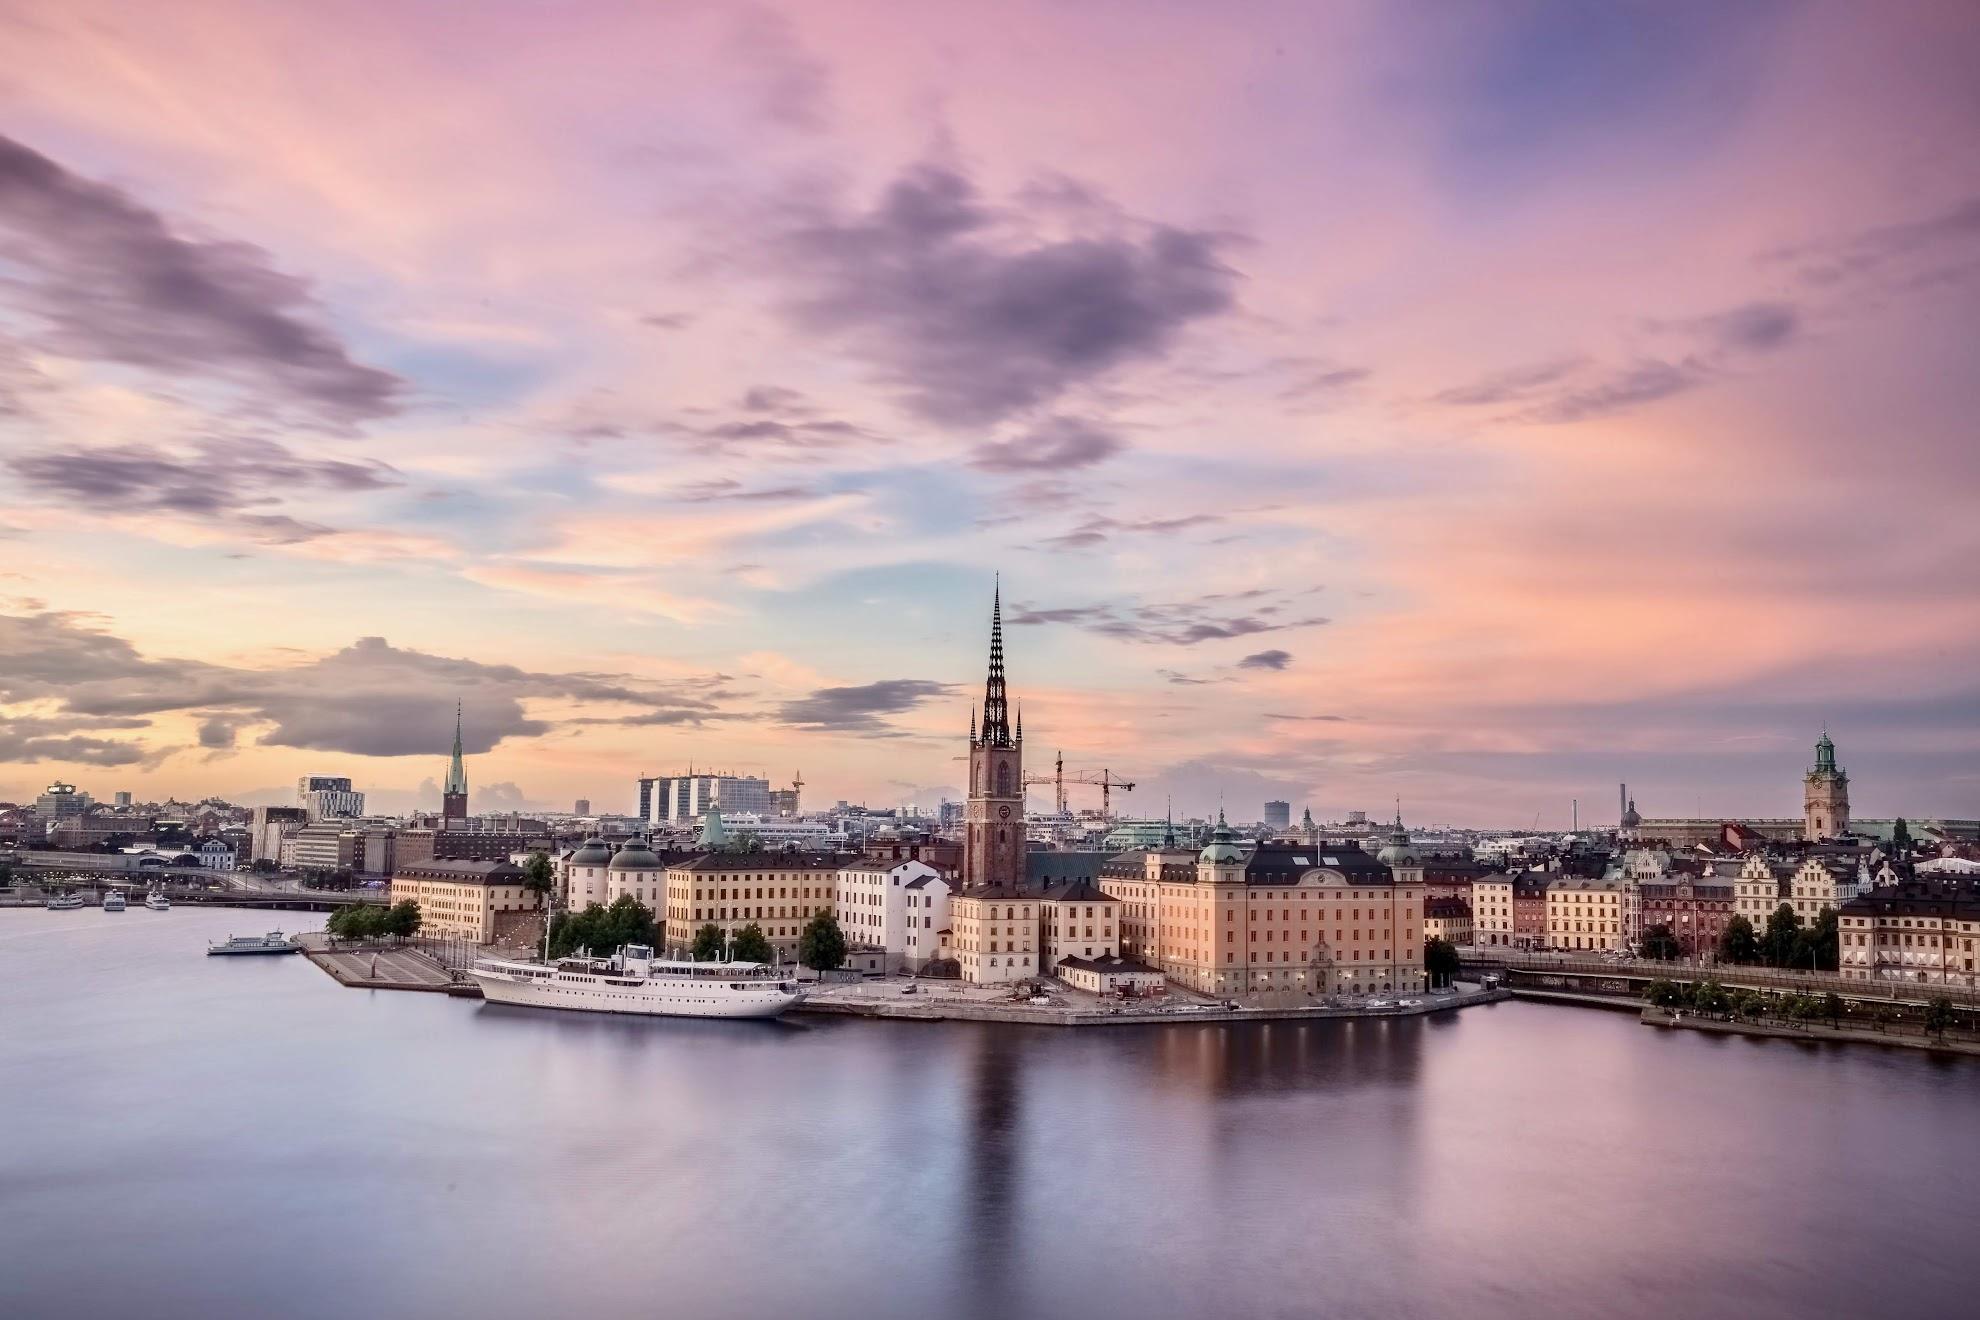 mooiste-steden-europa